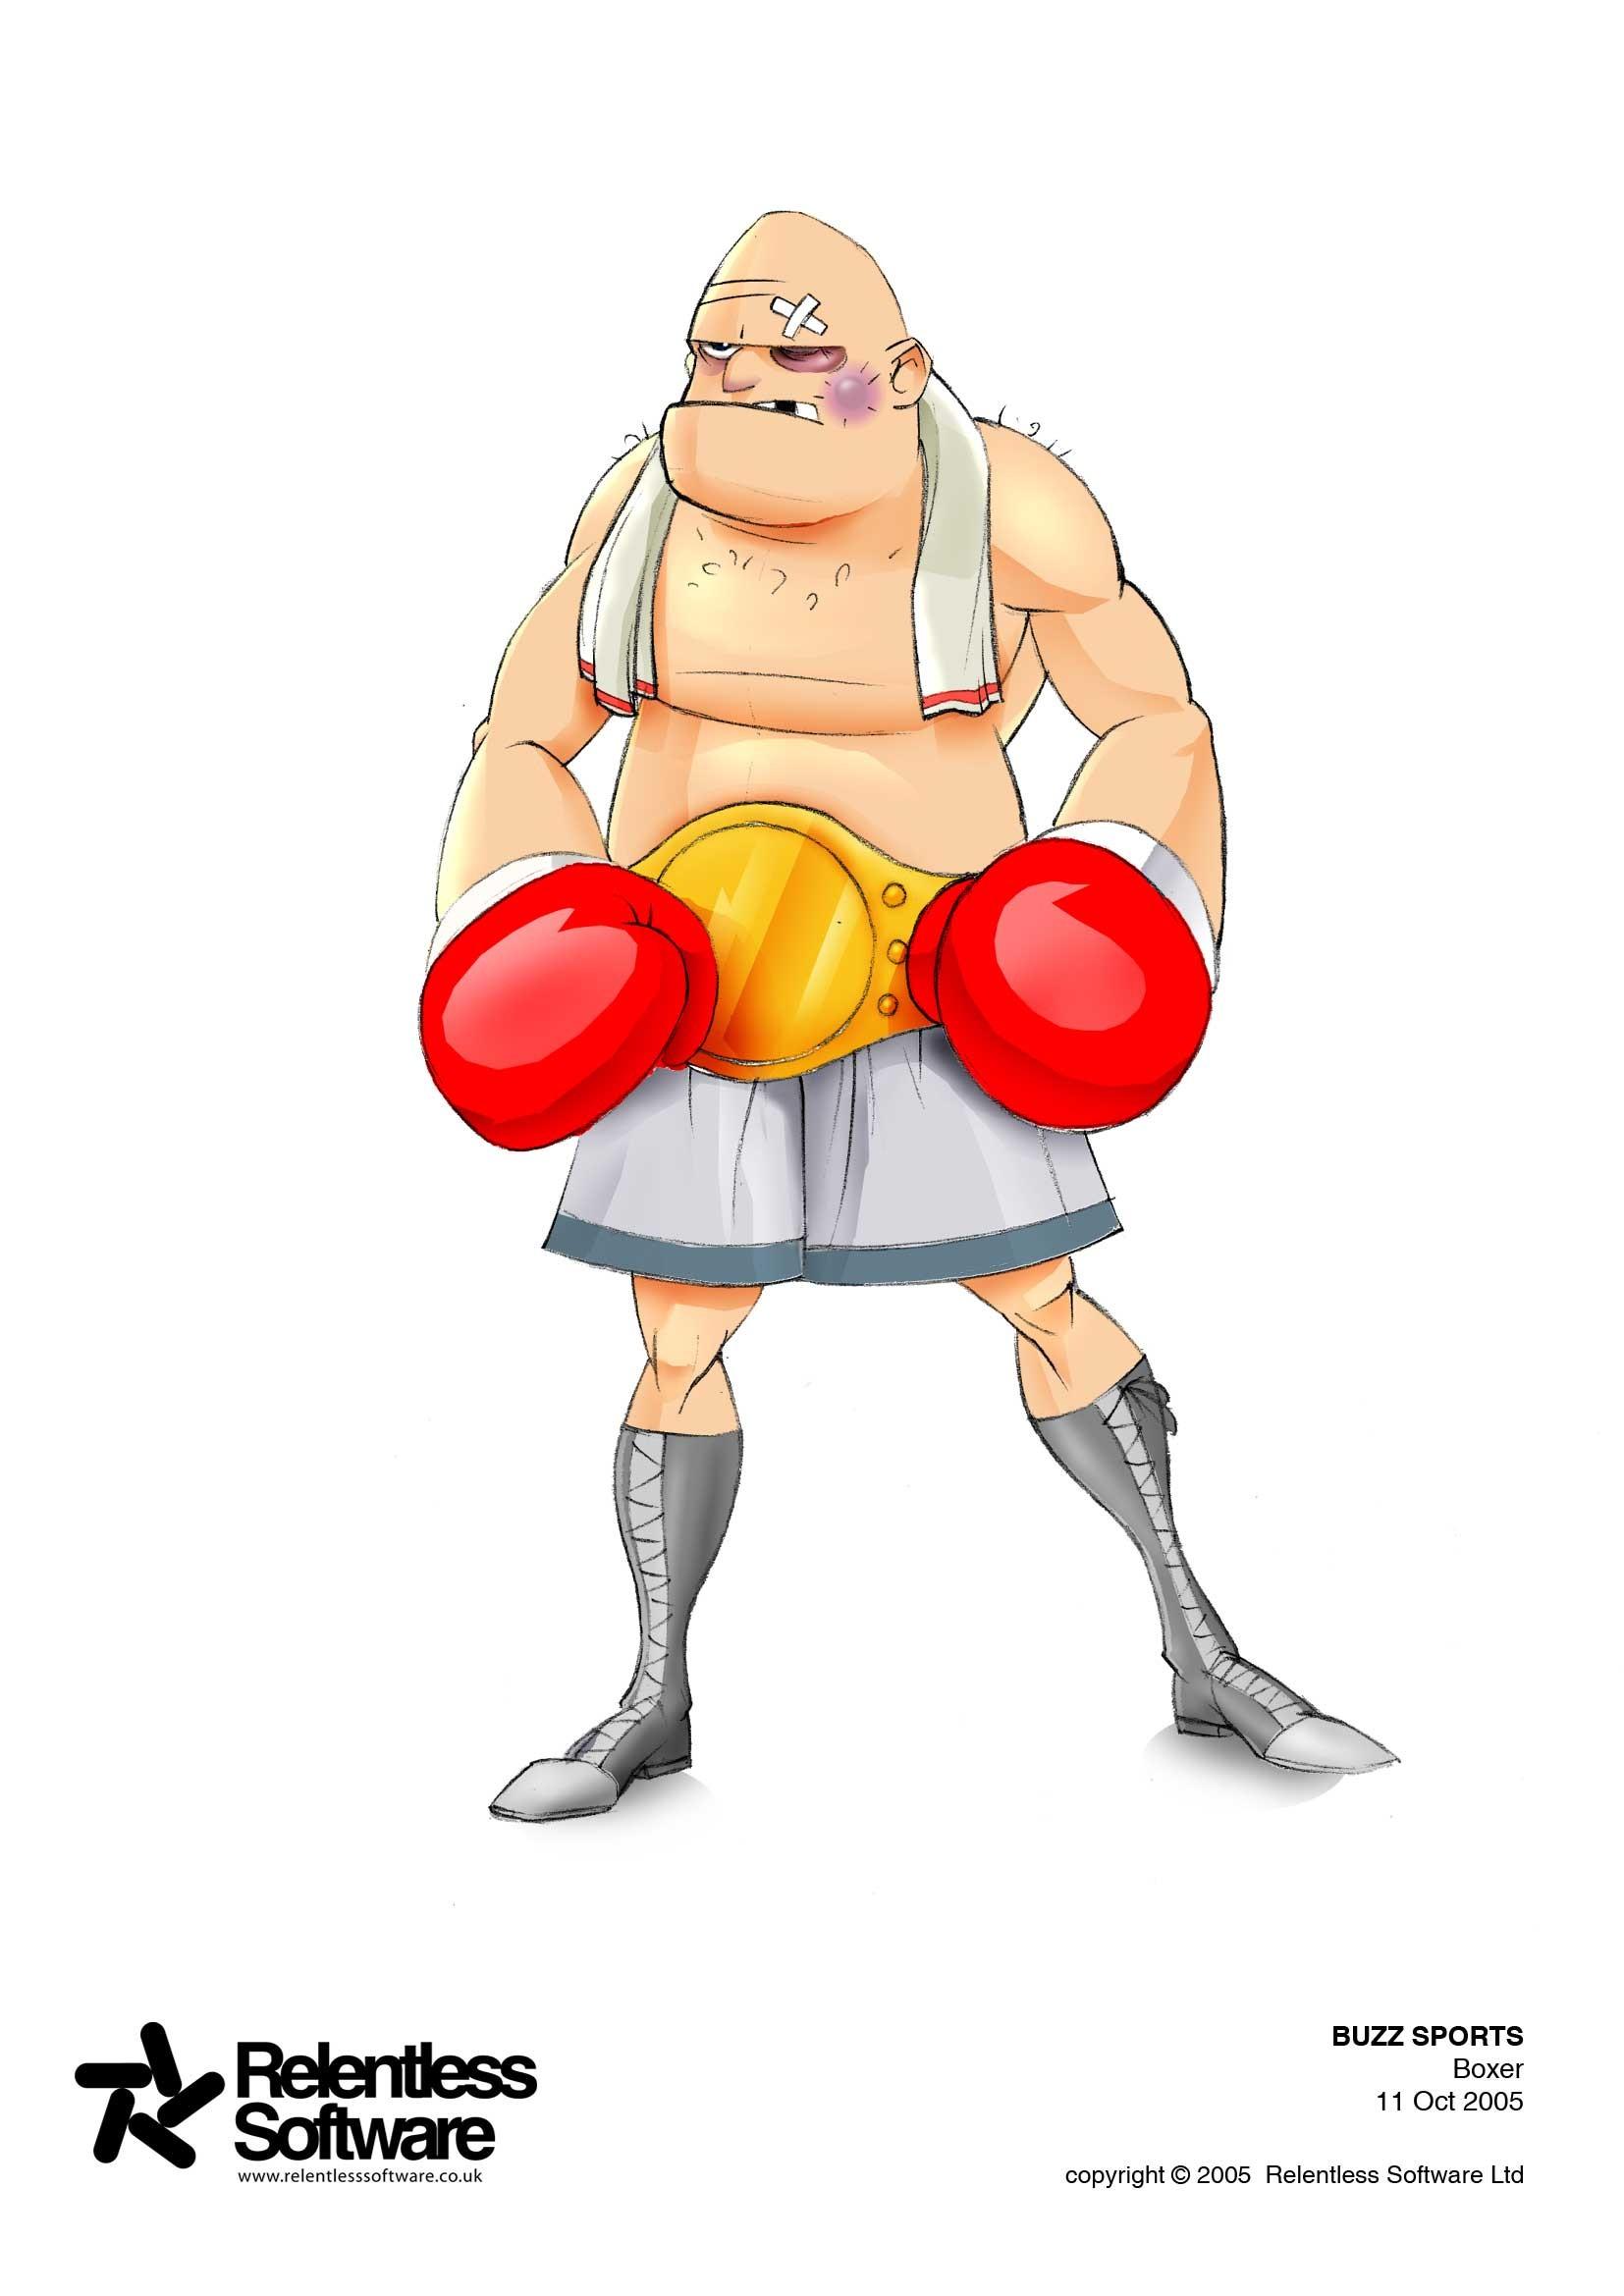 Colin morrison bzs boxer